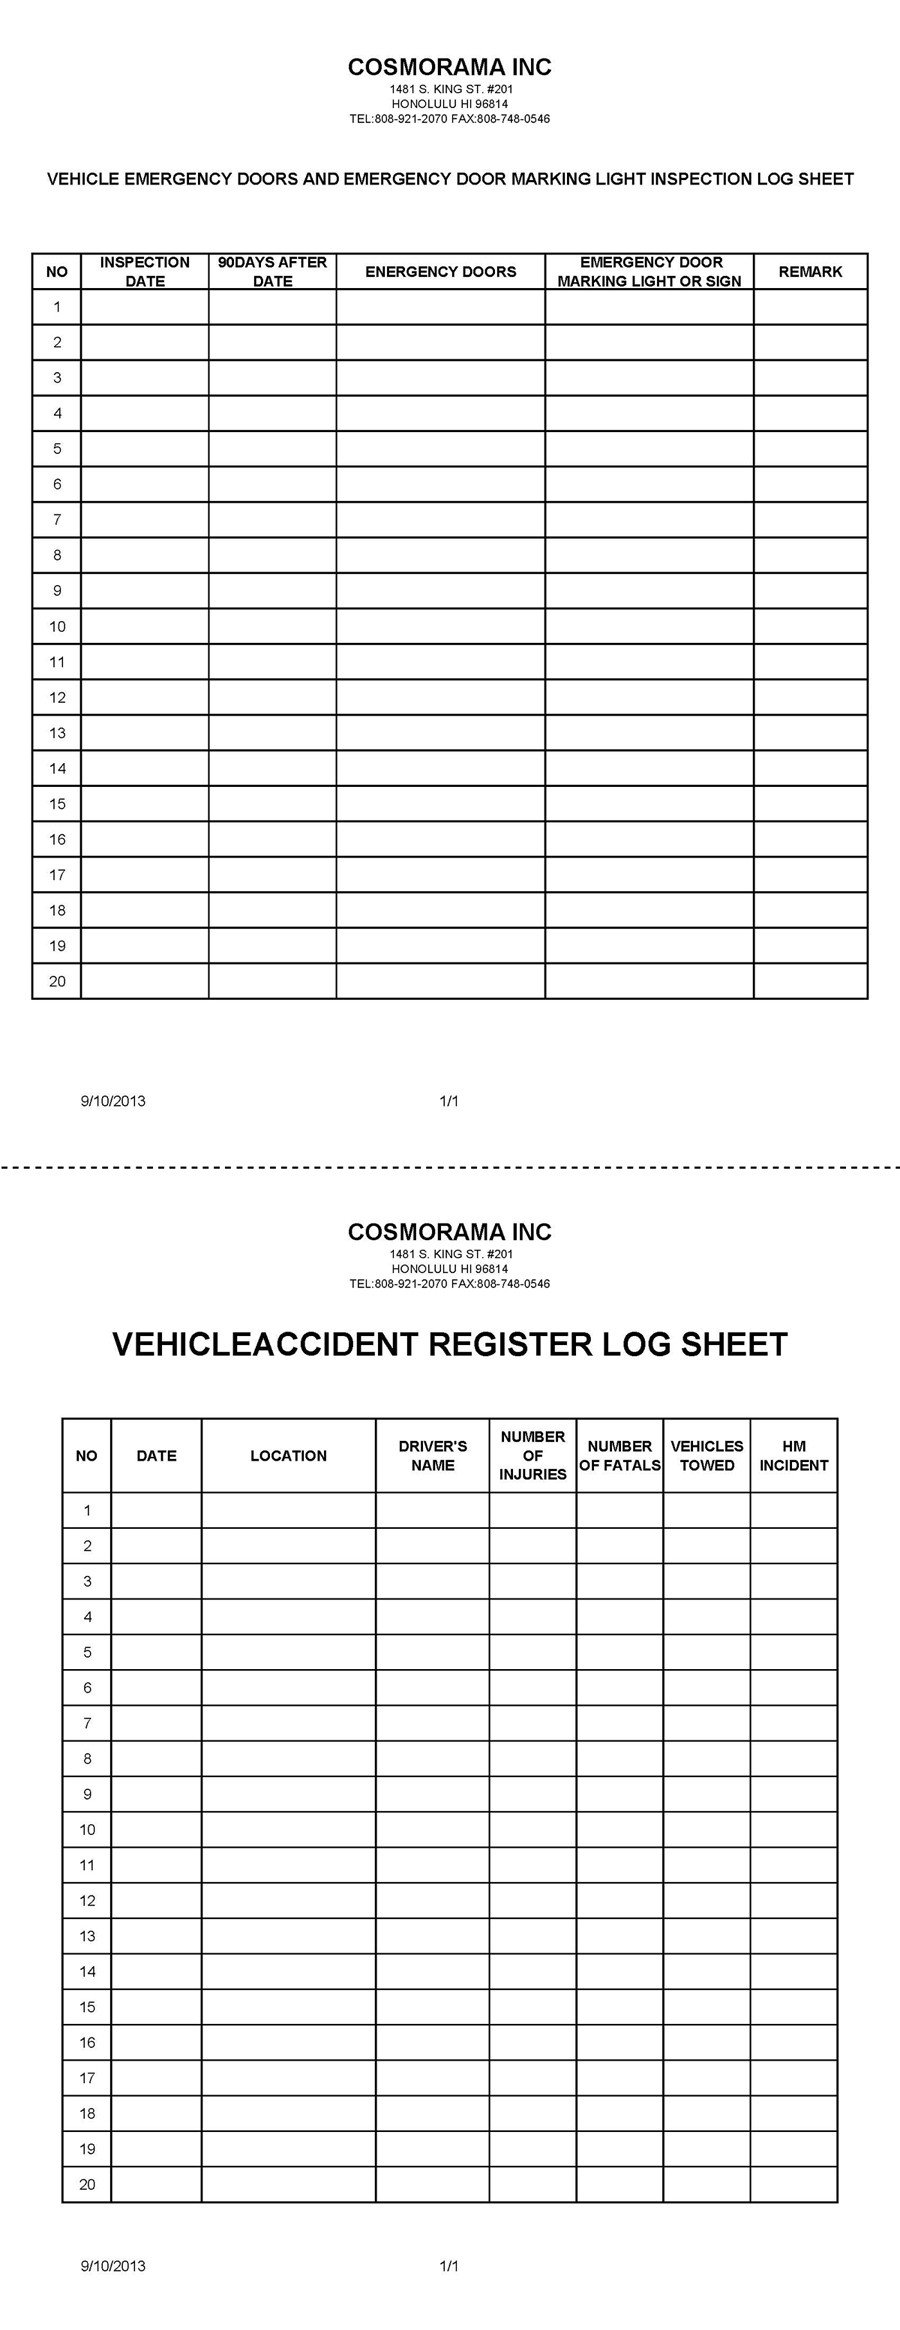 Inspection Log Sheet Cosmorama